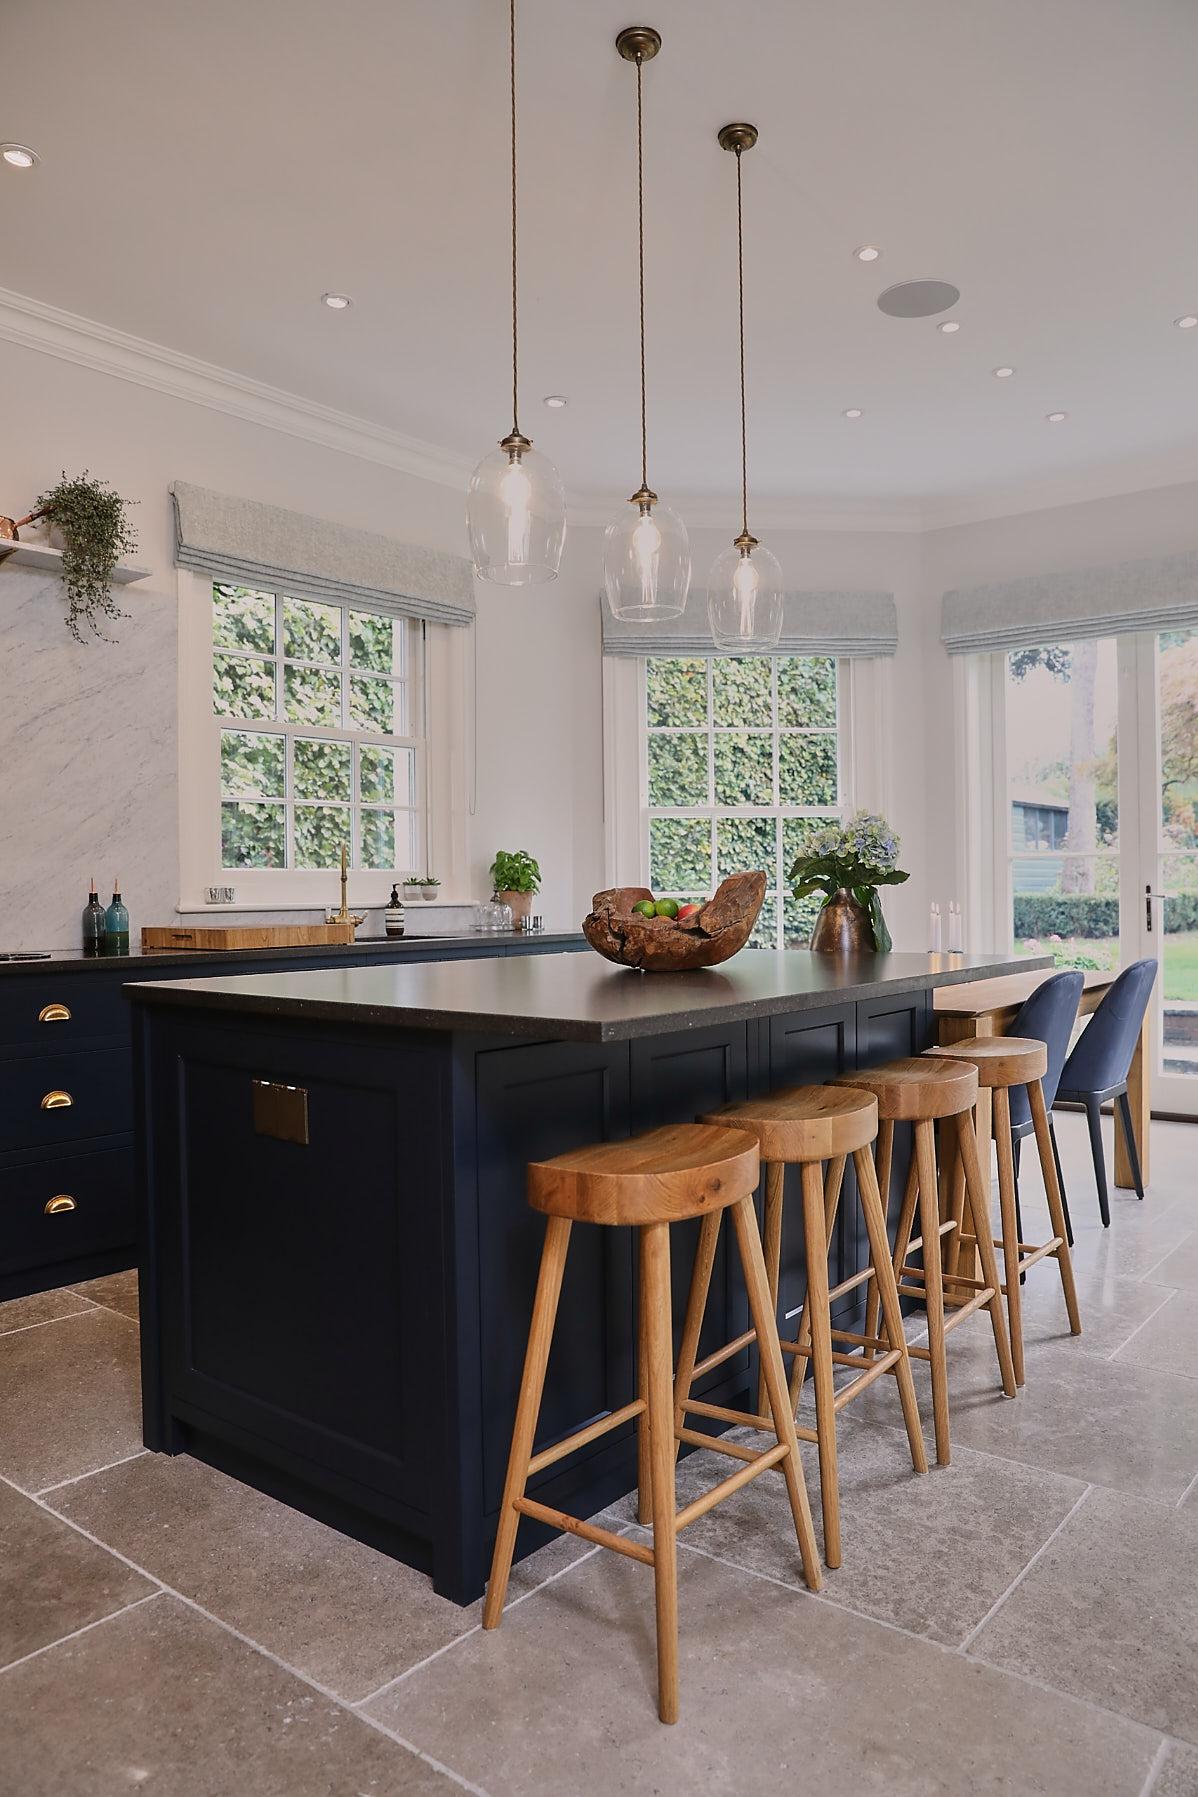 Blue kitchen island with oak barstools